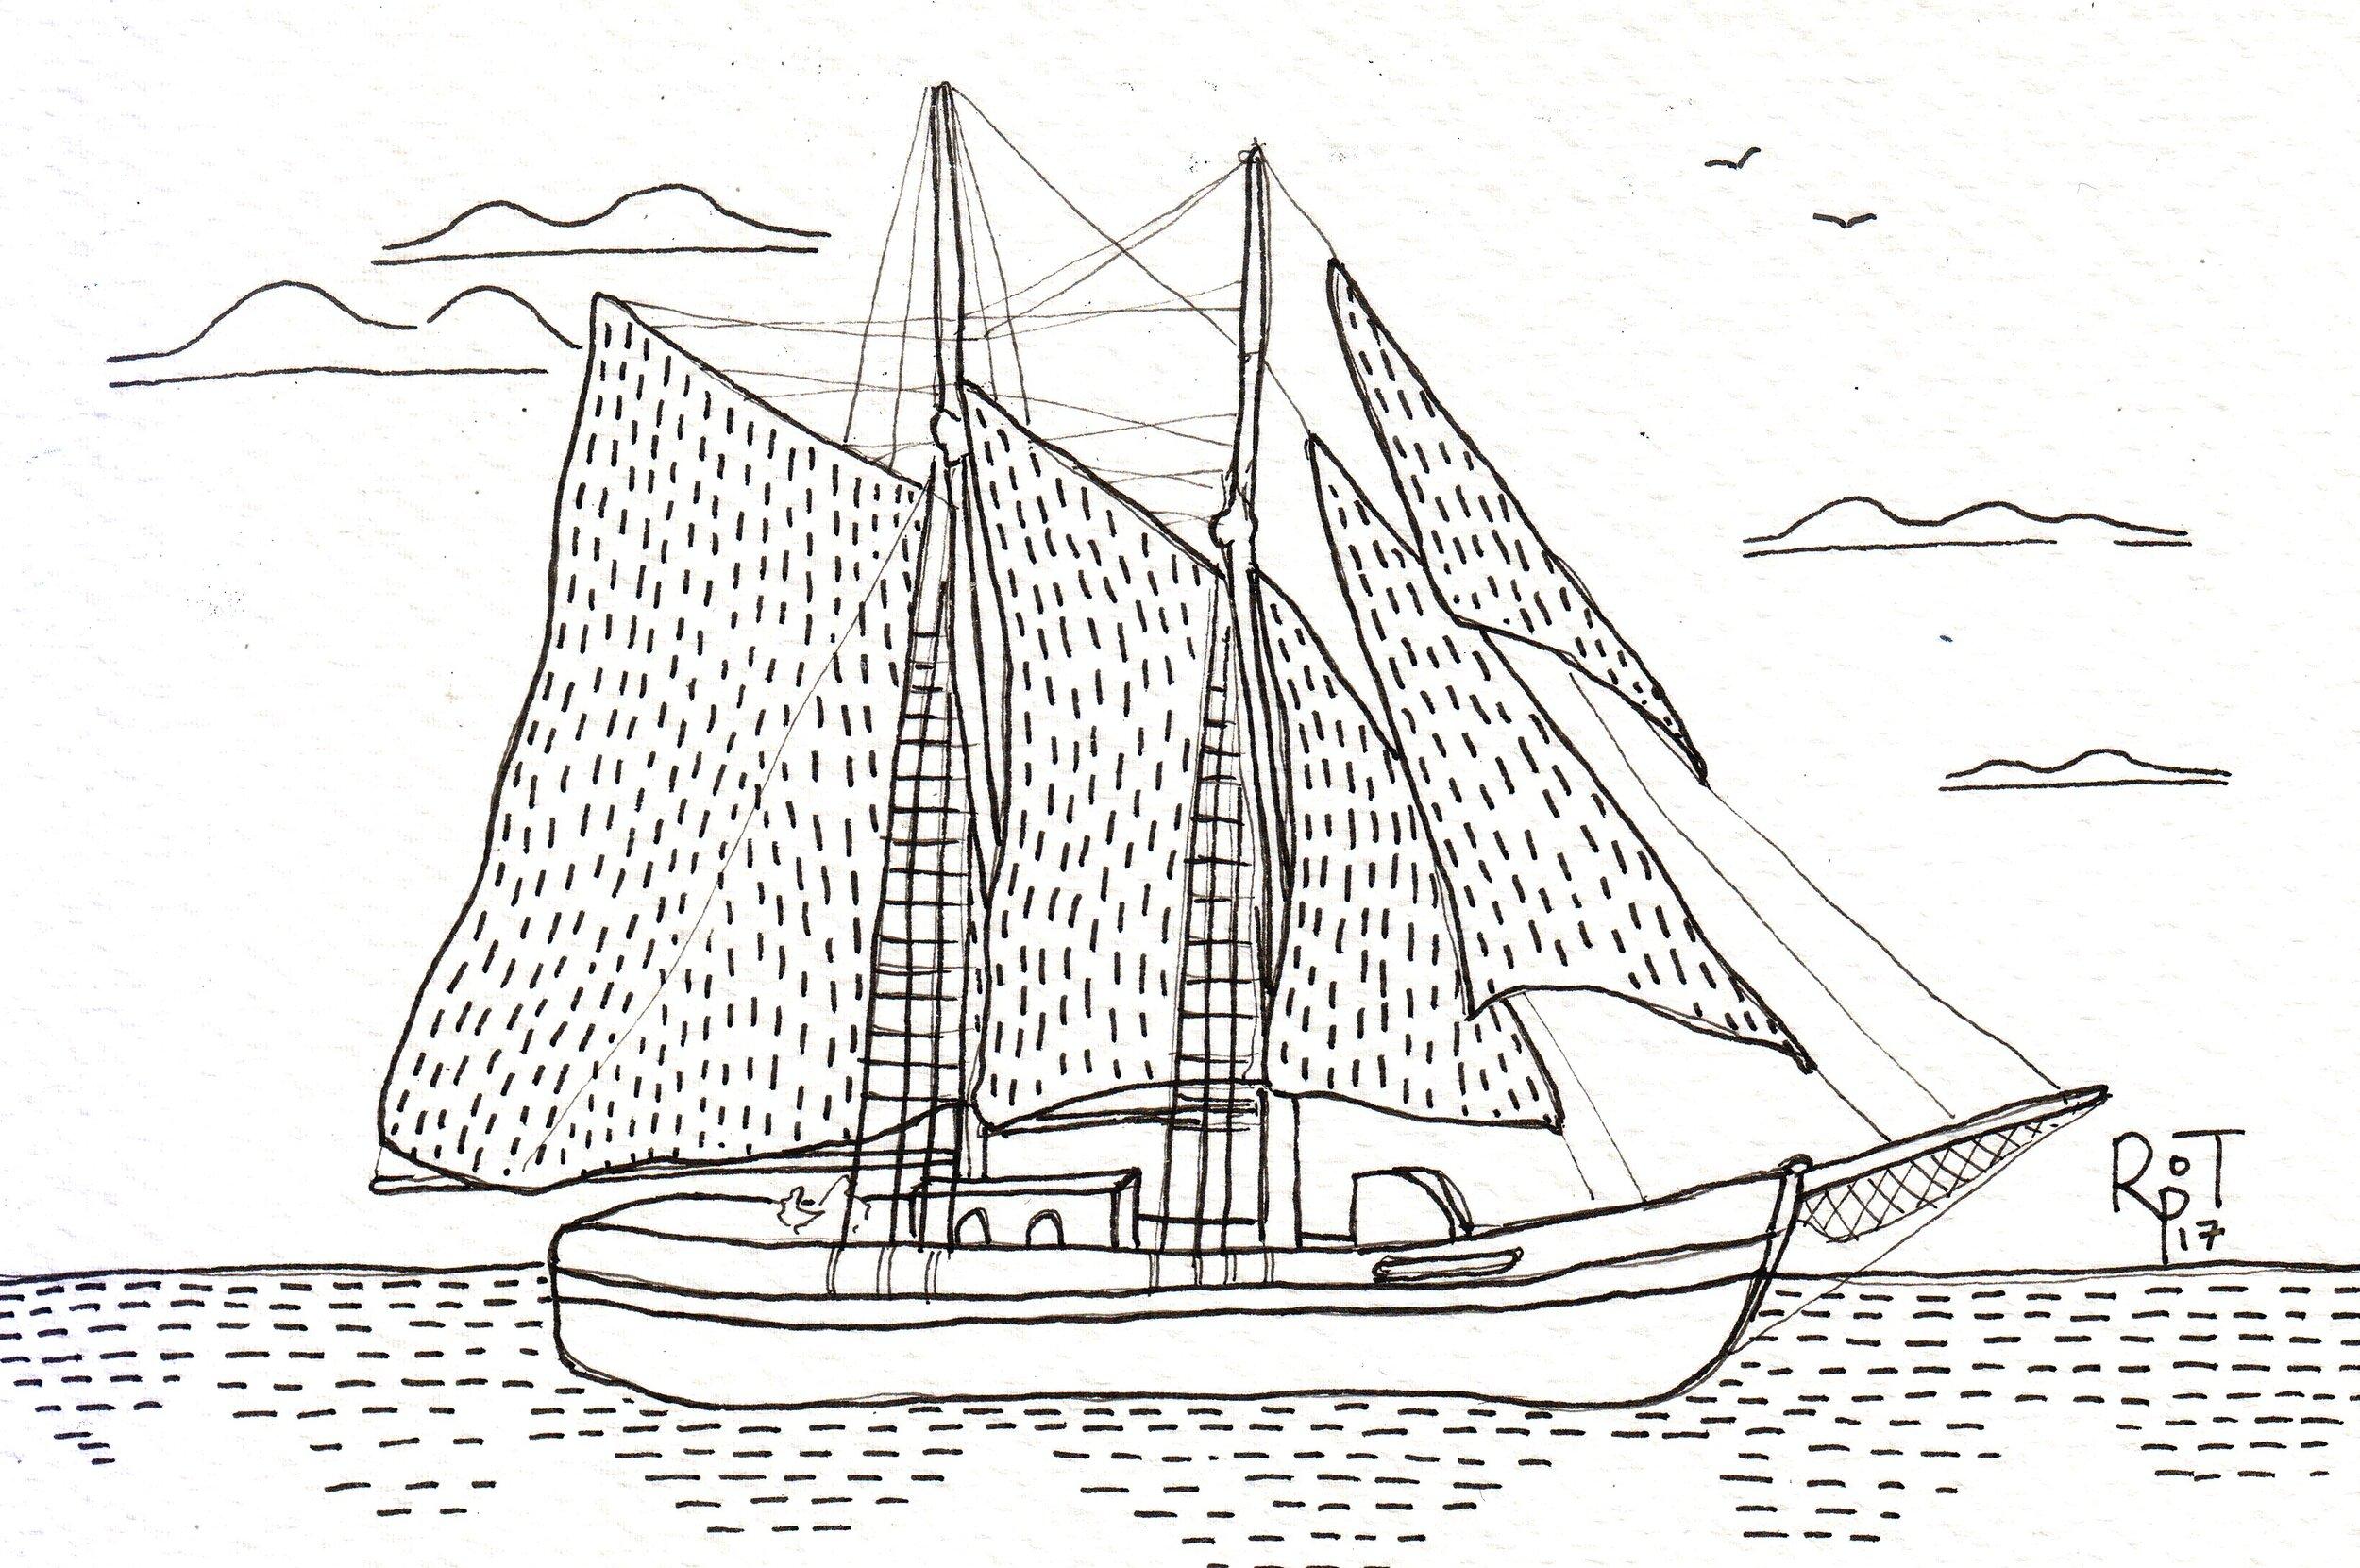 ROPT_Ship.JPG